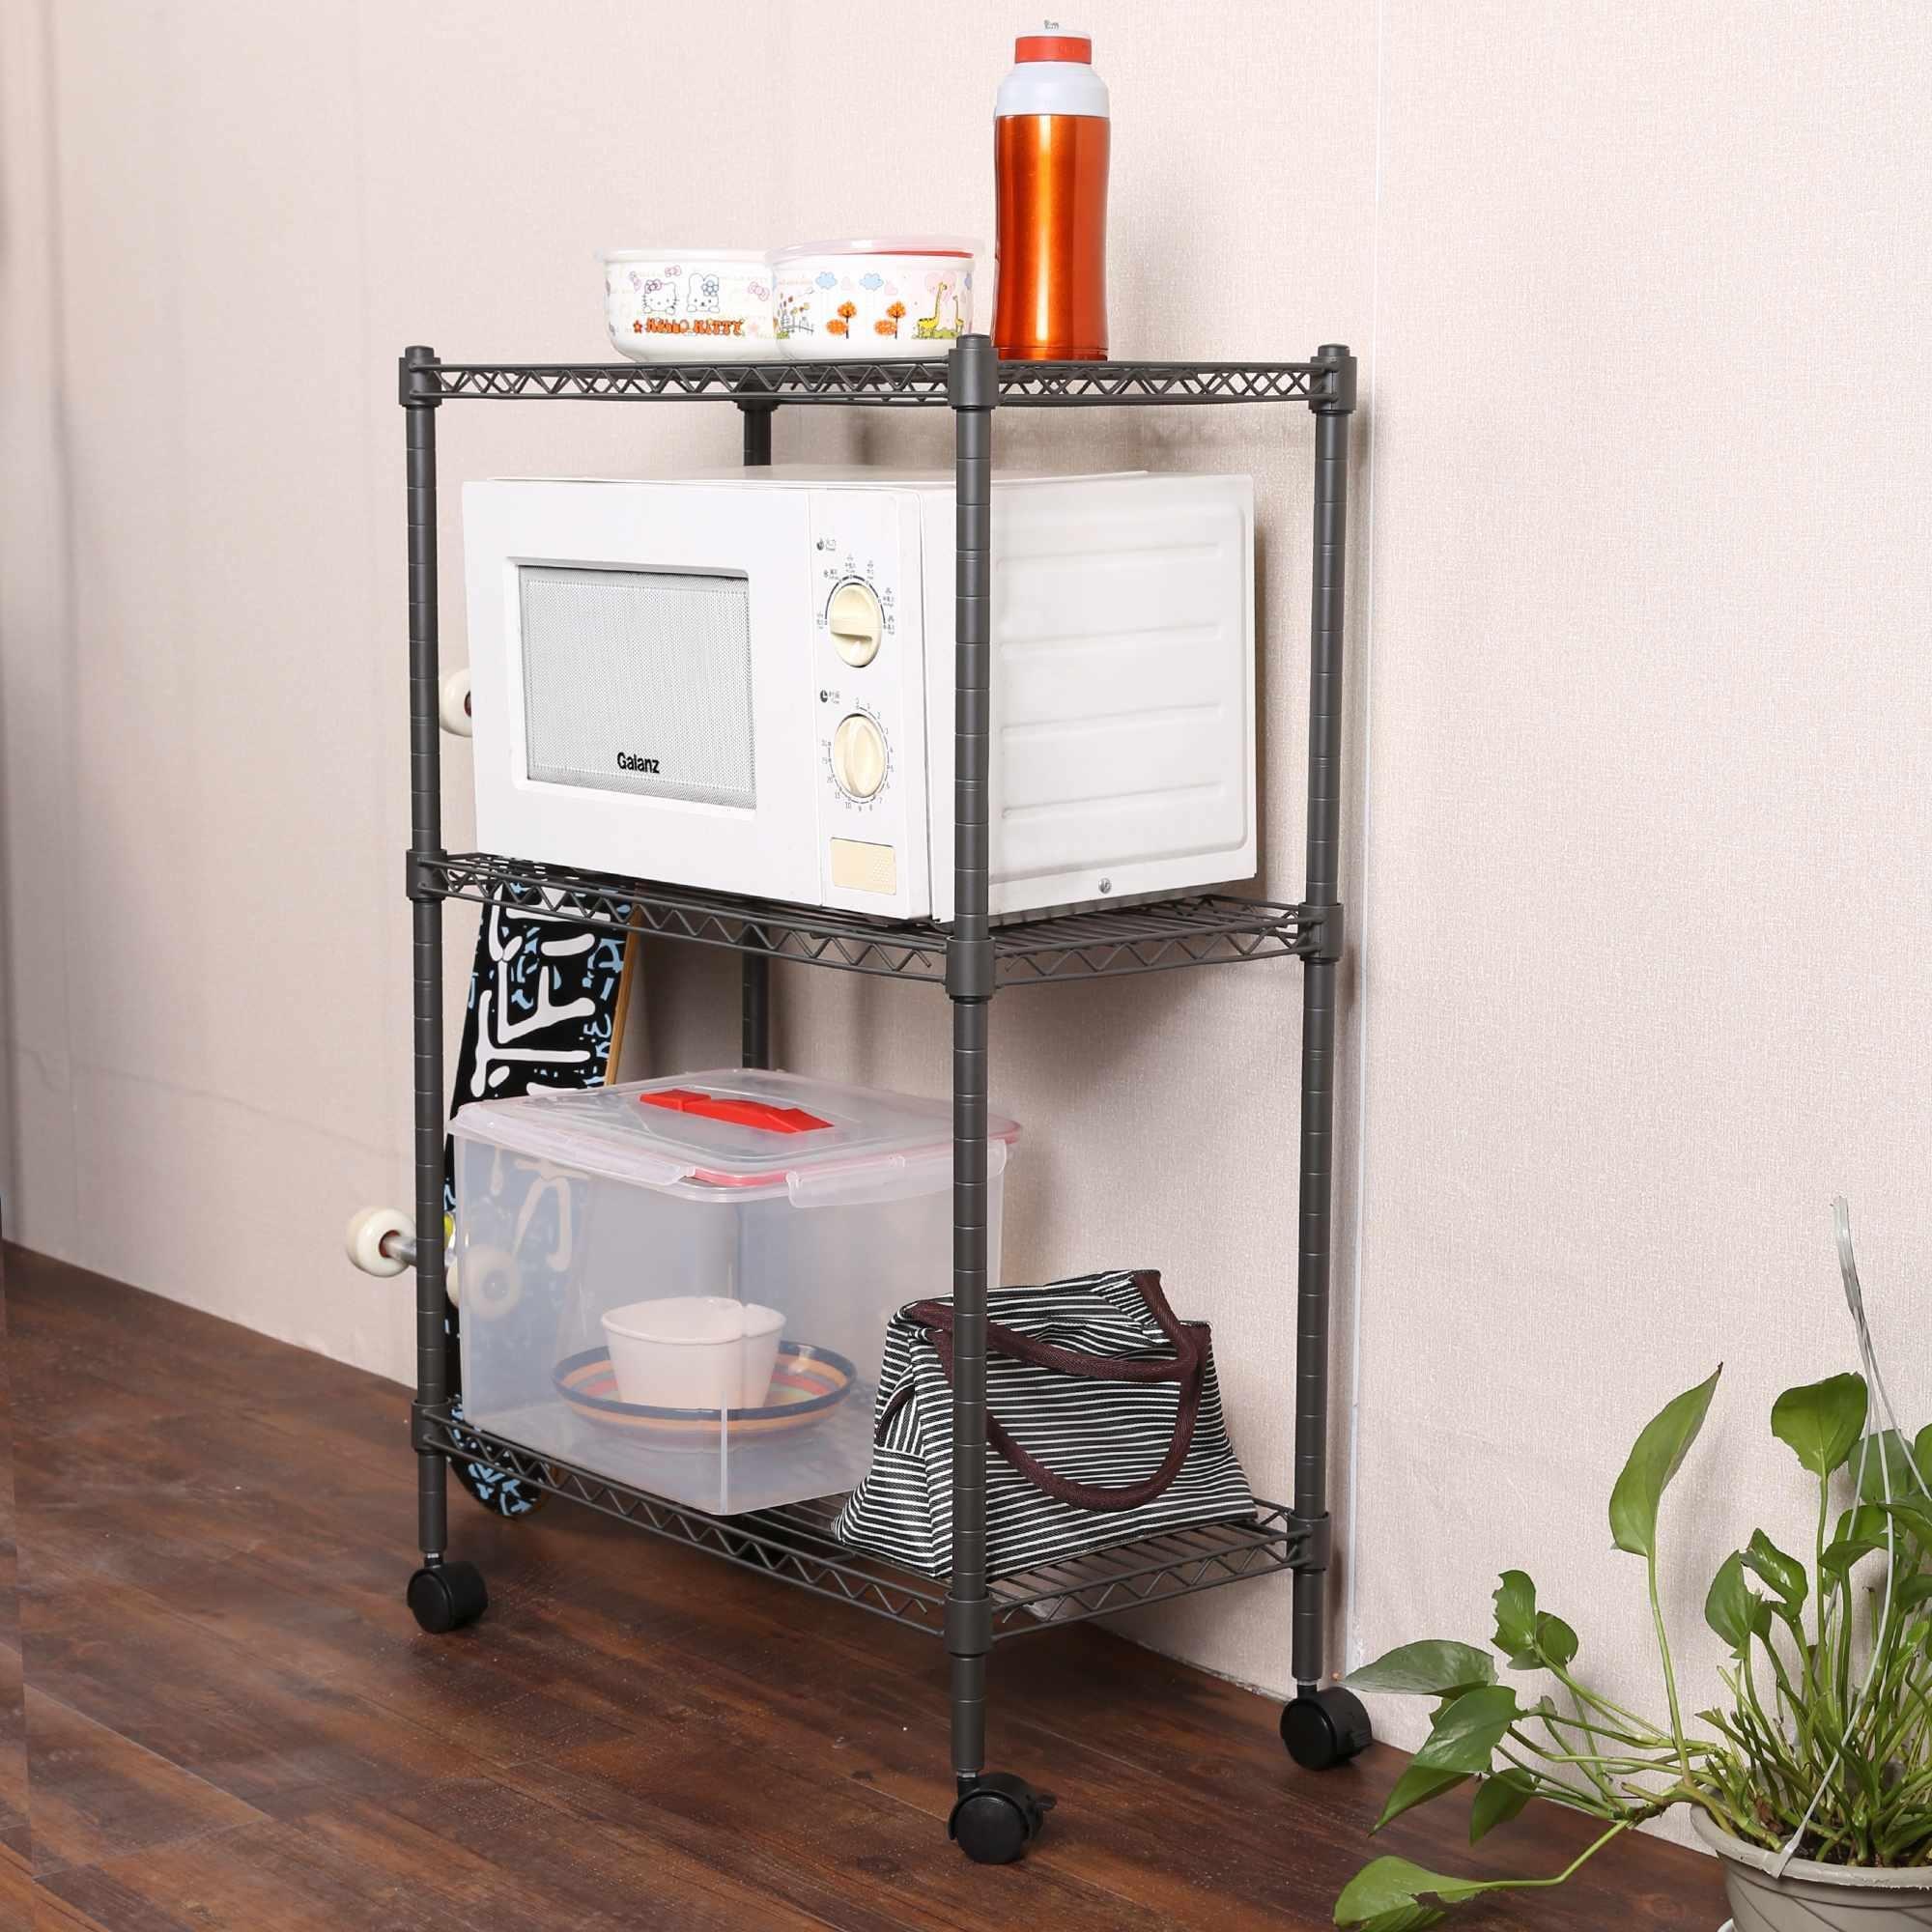 Keland Adjustable Metal 3-Tier Shelving Unit, 23.4''x 11.7''x 33.5'' Storage Rack On Wheels for Kitchen,Bathroom,Livingroom (Gray)